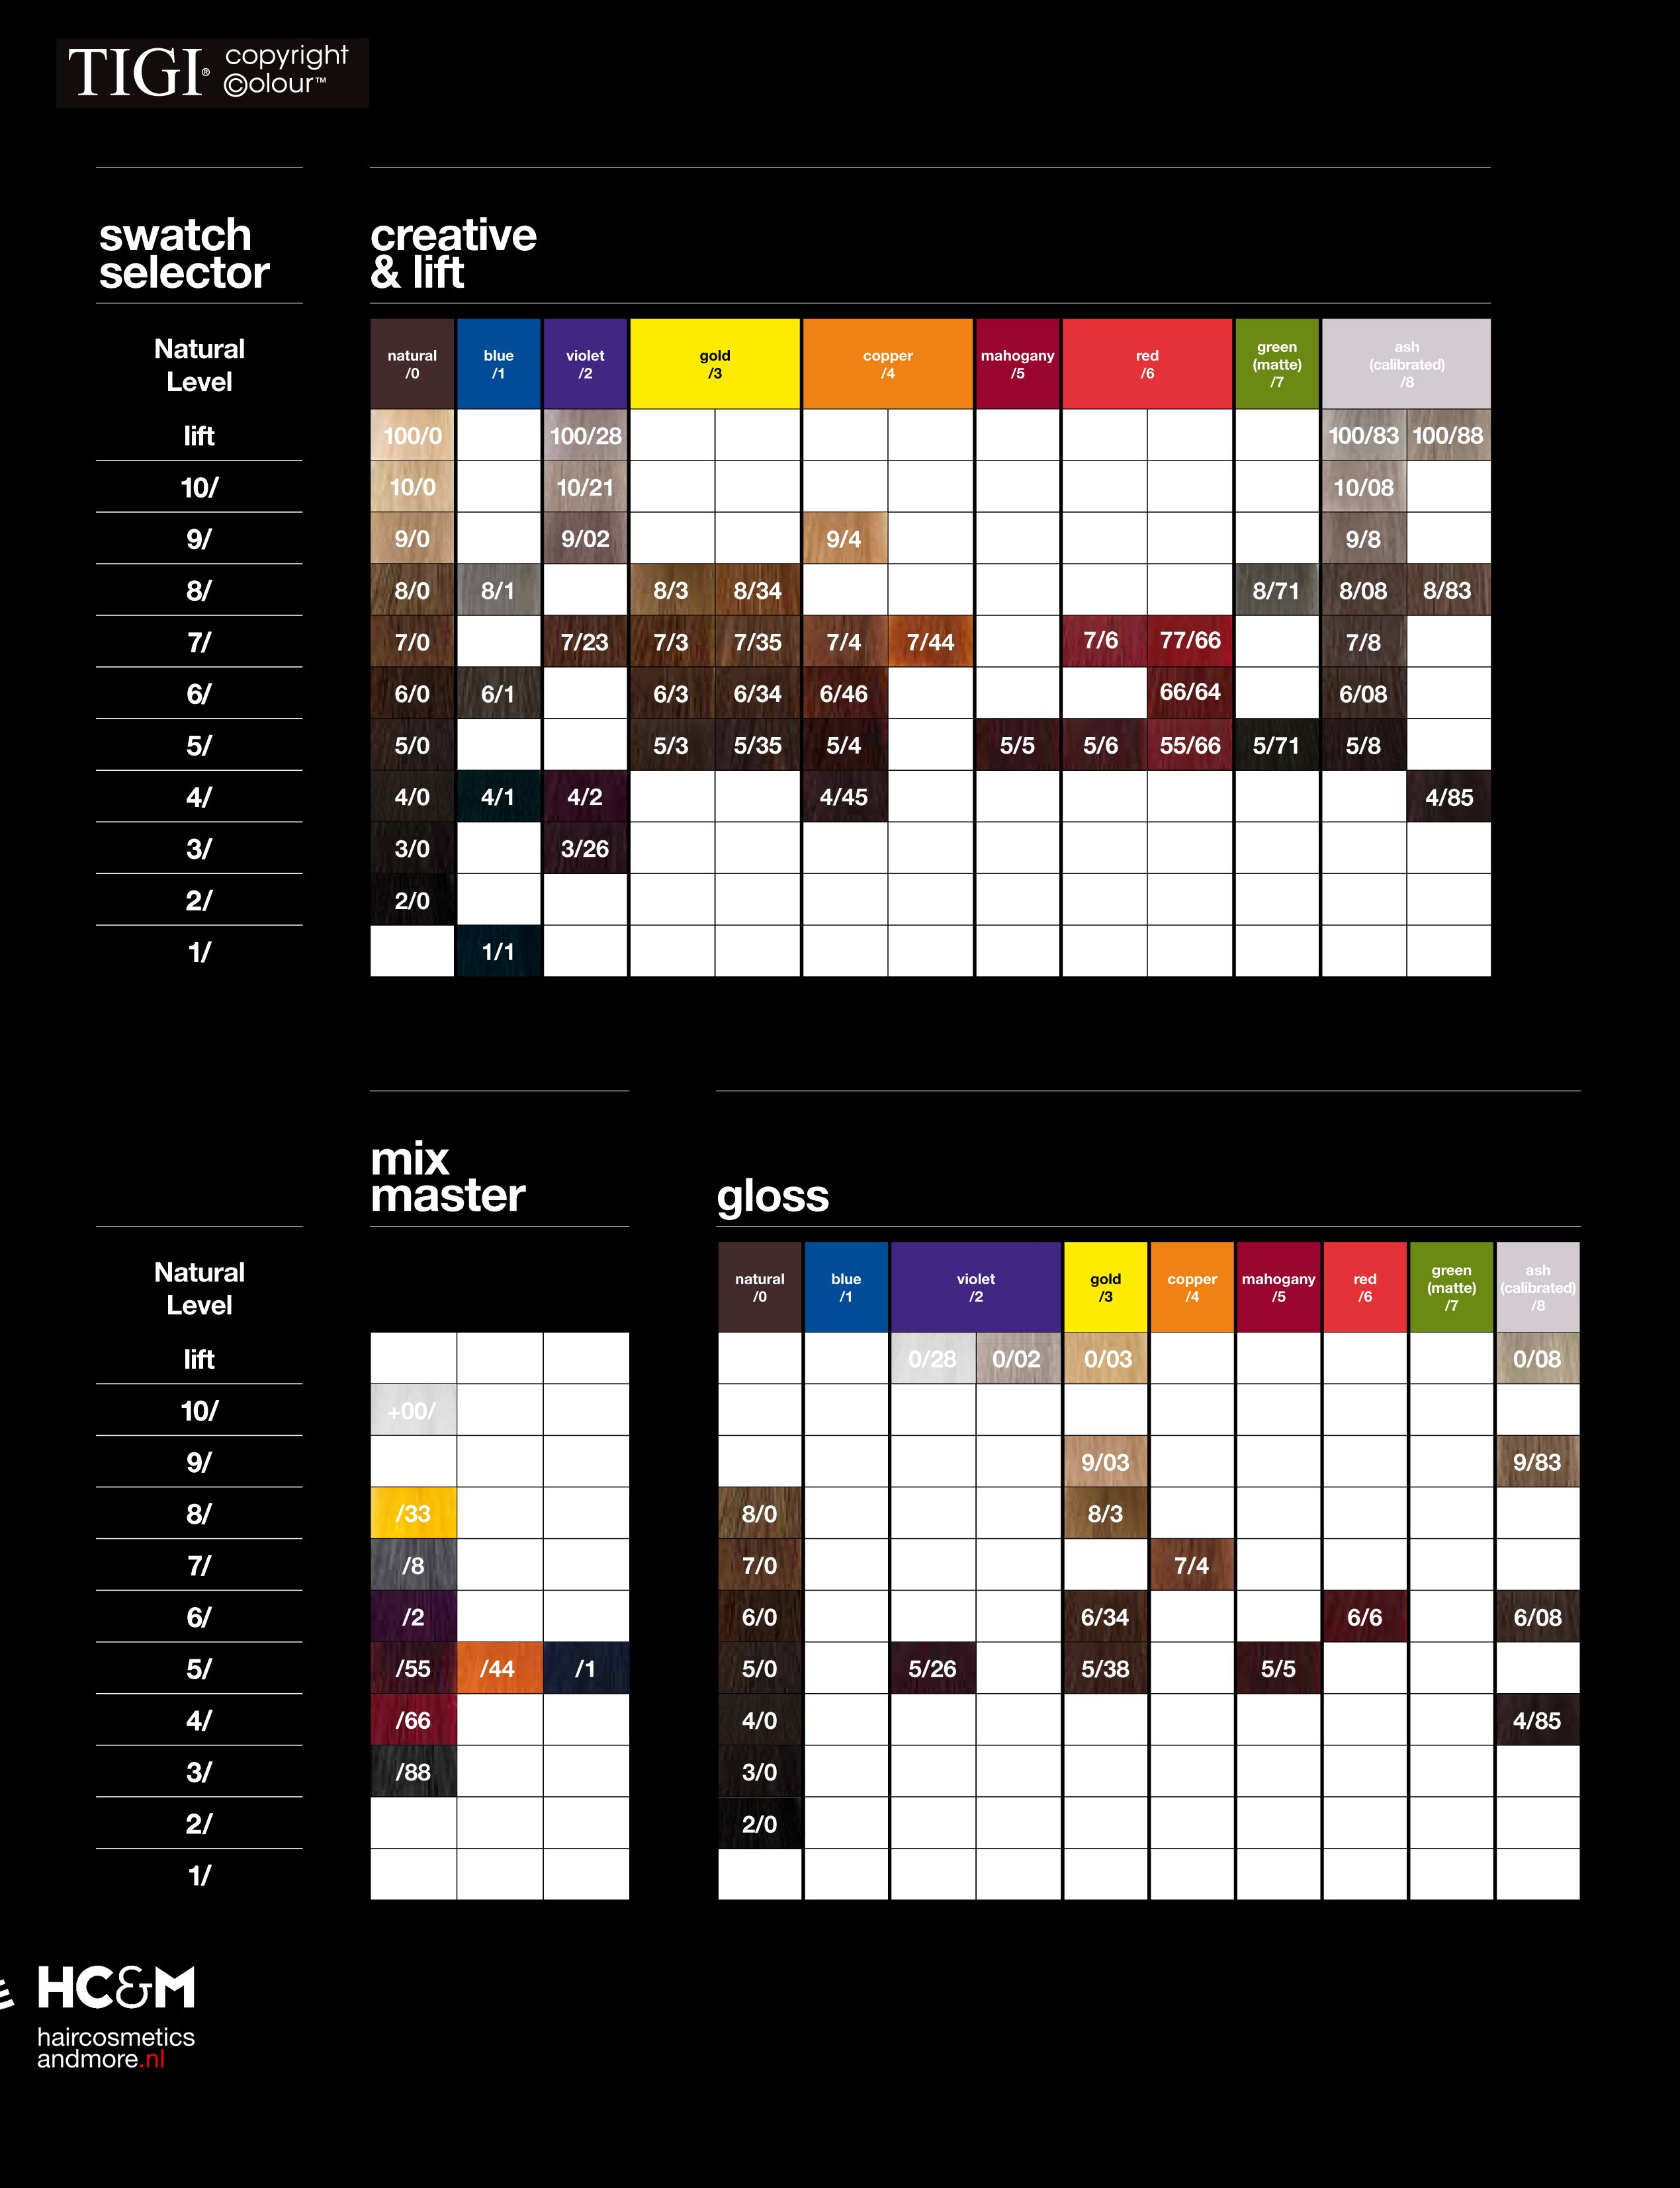 Tigi Copyright Colour Swatch Chart Hair Color Chart Hair Color Hair Color Formulas